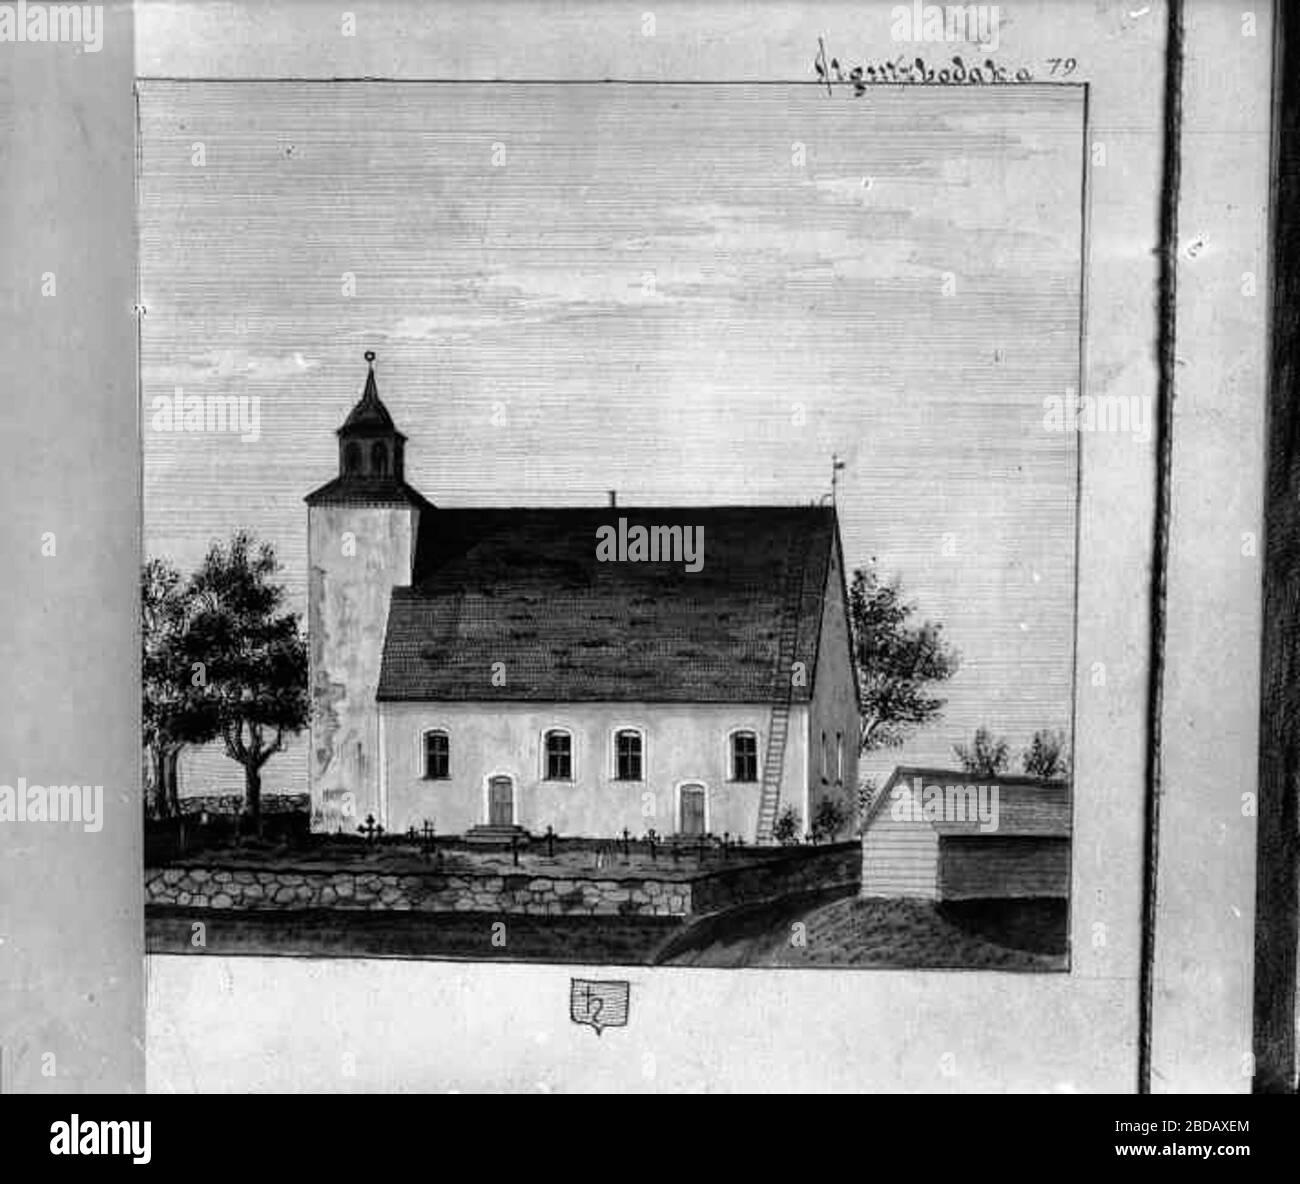 Algutsboda Parish, Kronoberg, Sweden Genealogy